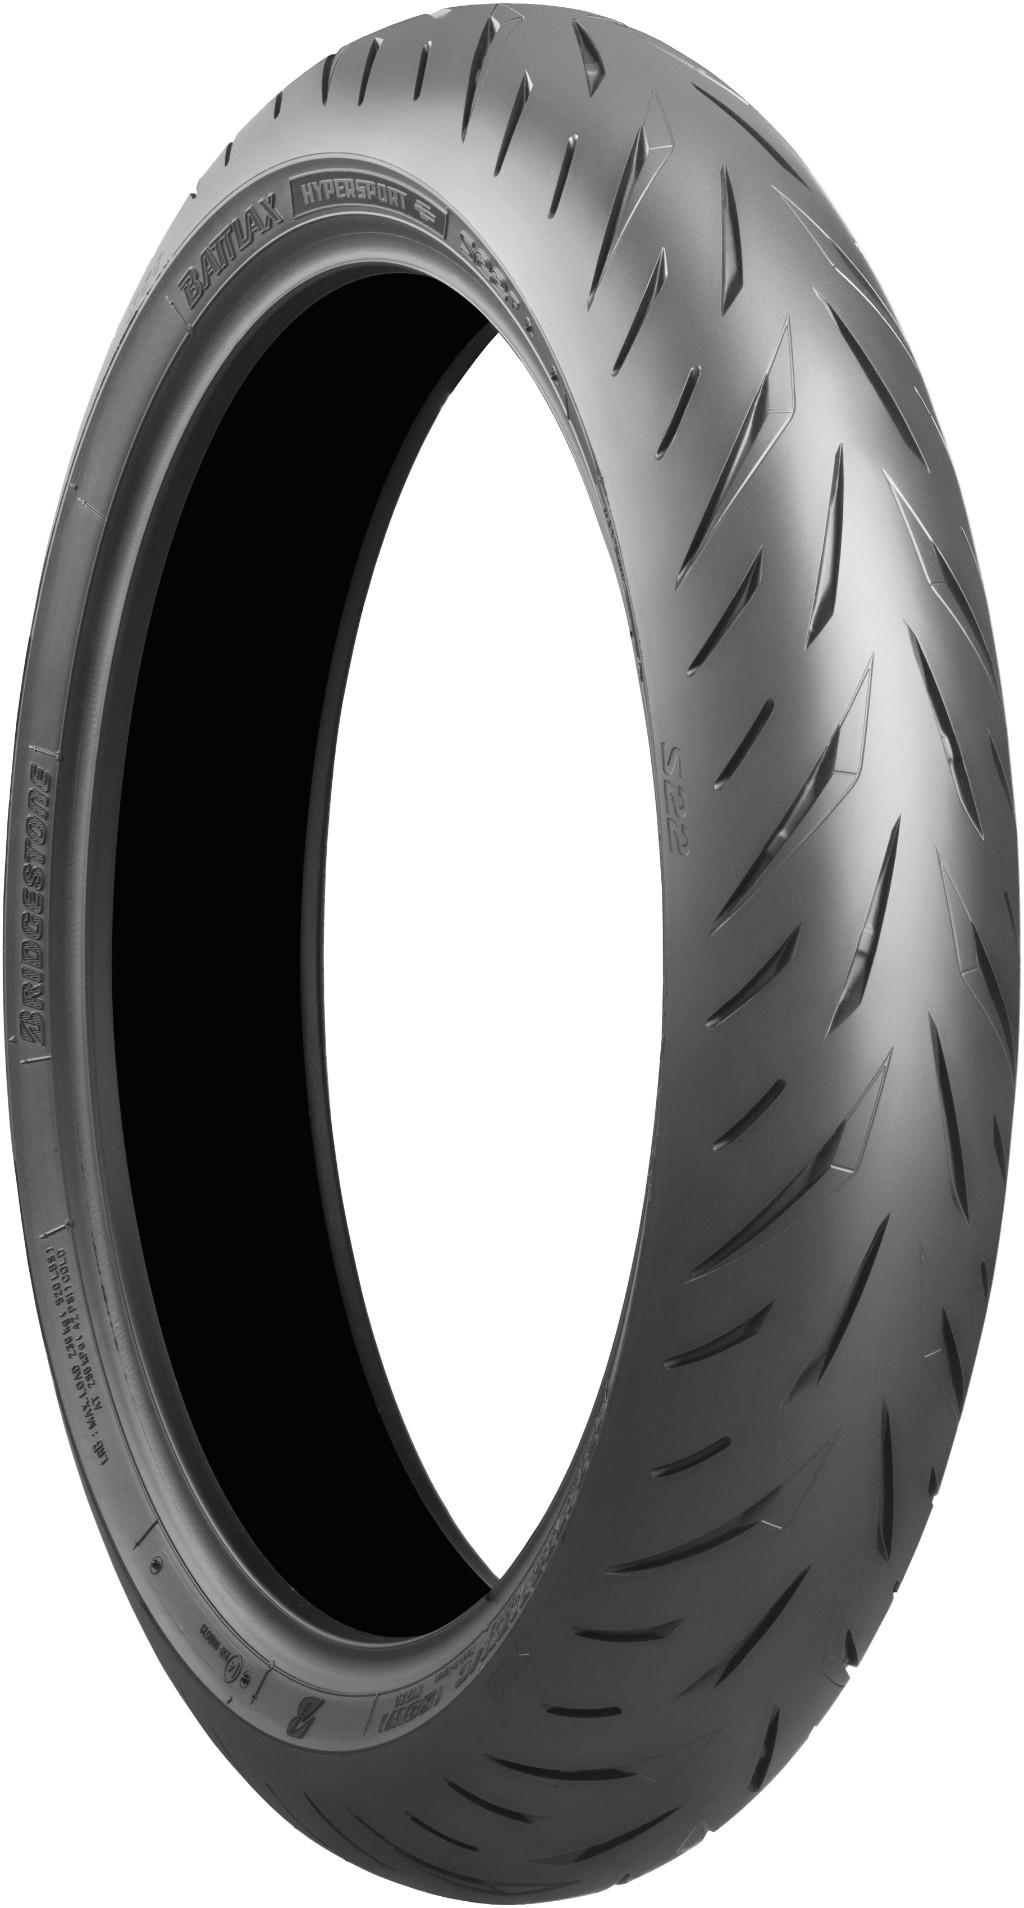 BATTLAX HYPER SPORT S22【110/70 R17M/C 54H T/L】 バトラックス ハイパースポーツ タイヤ